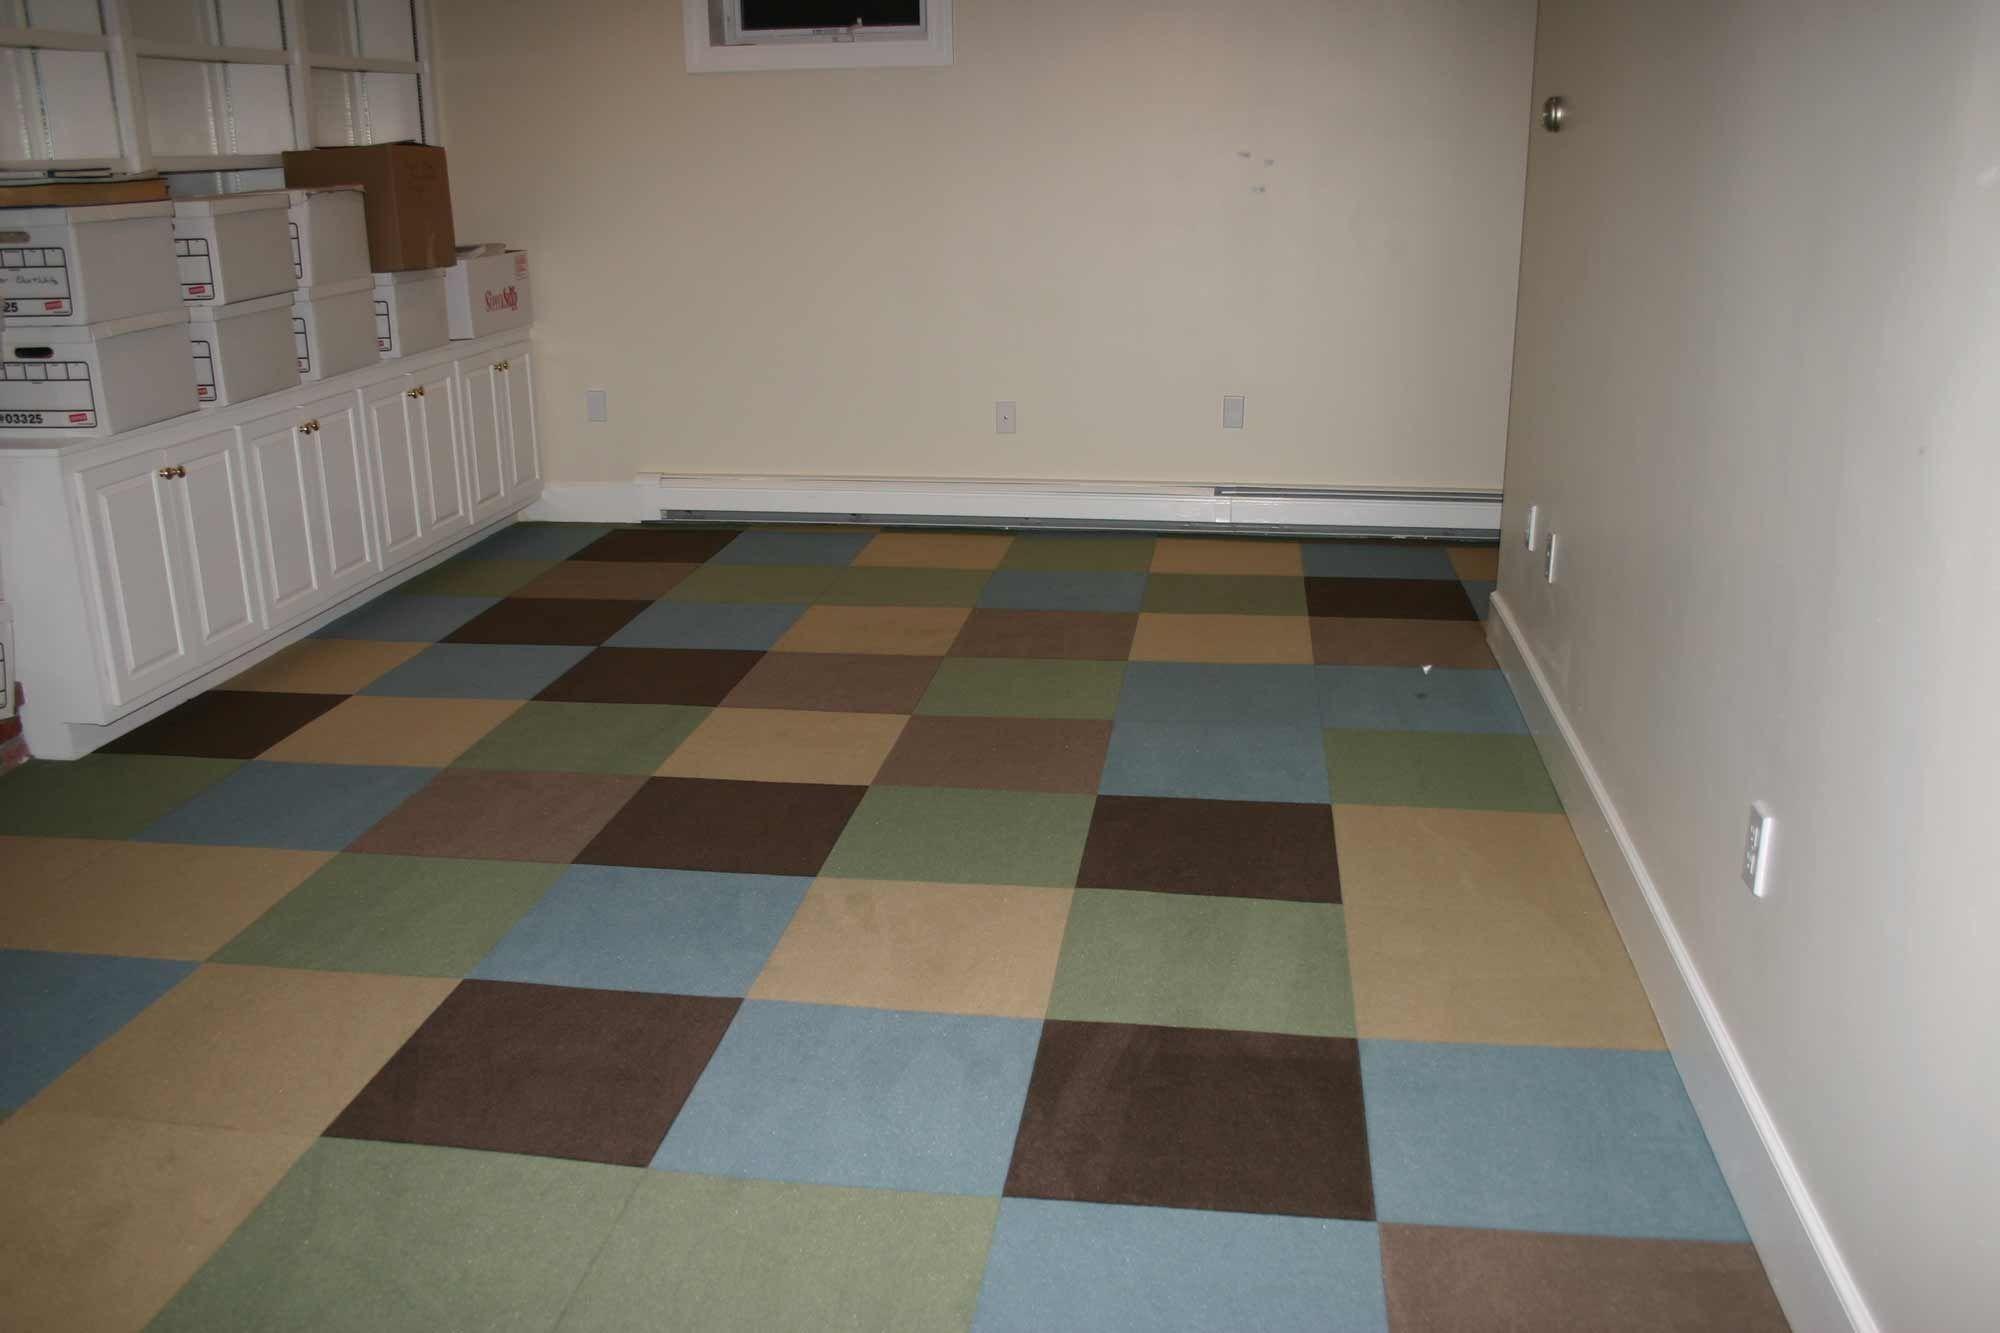 Best Flooring For Damp Cement Basement Httpdreamtreeus - Best flooring for moist basement